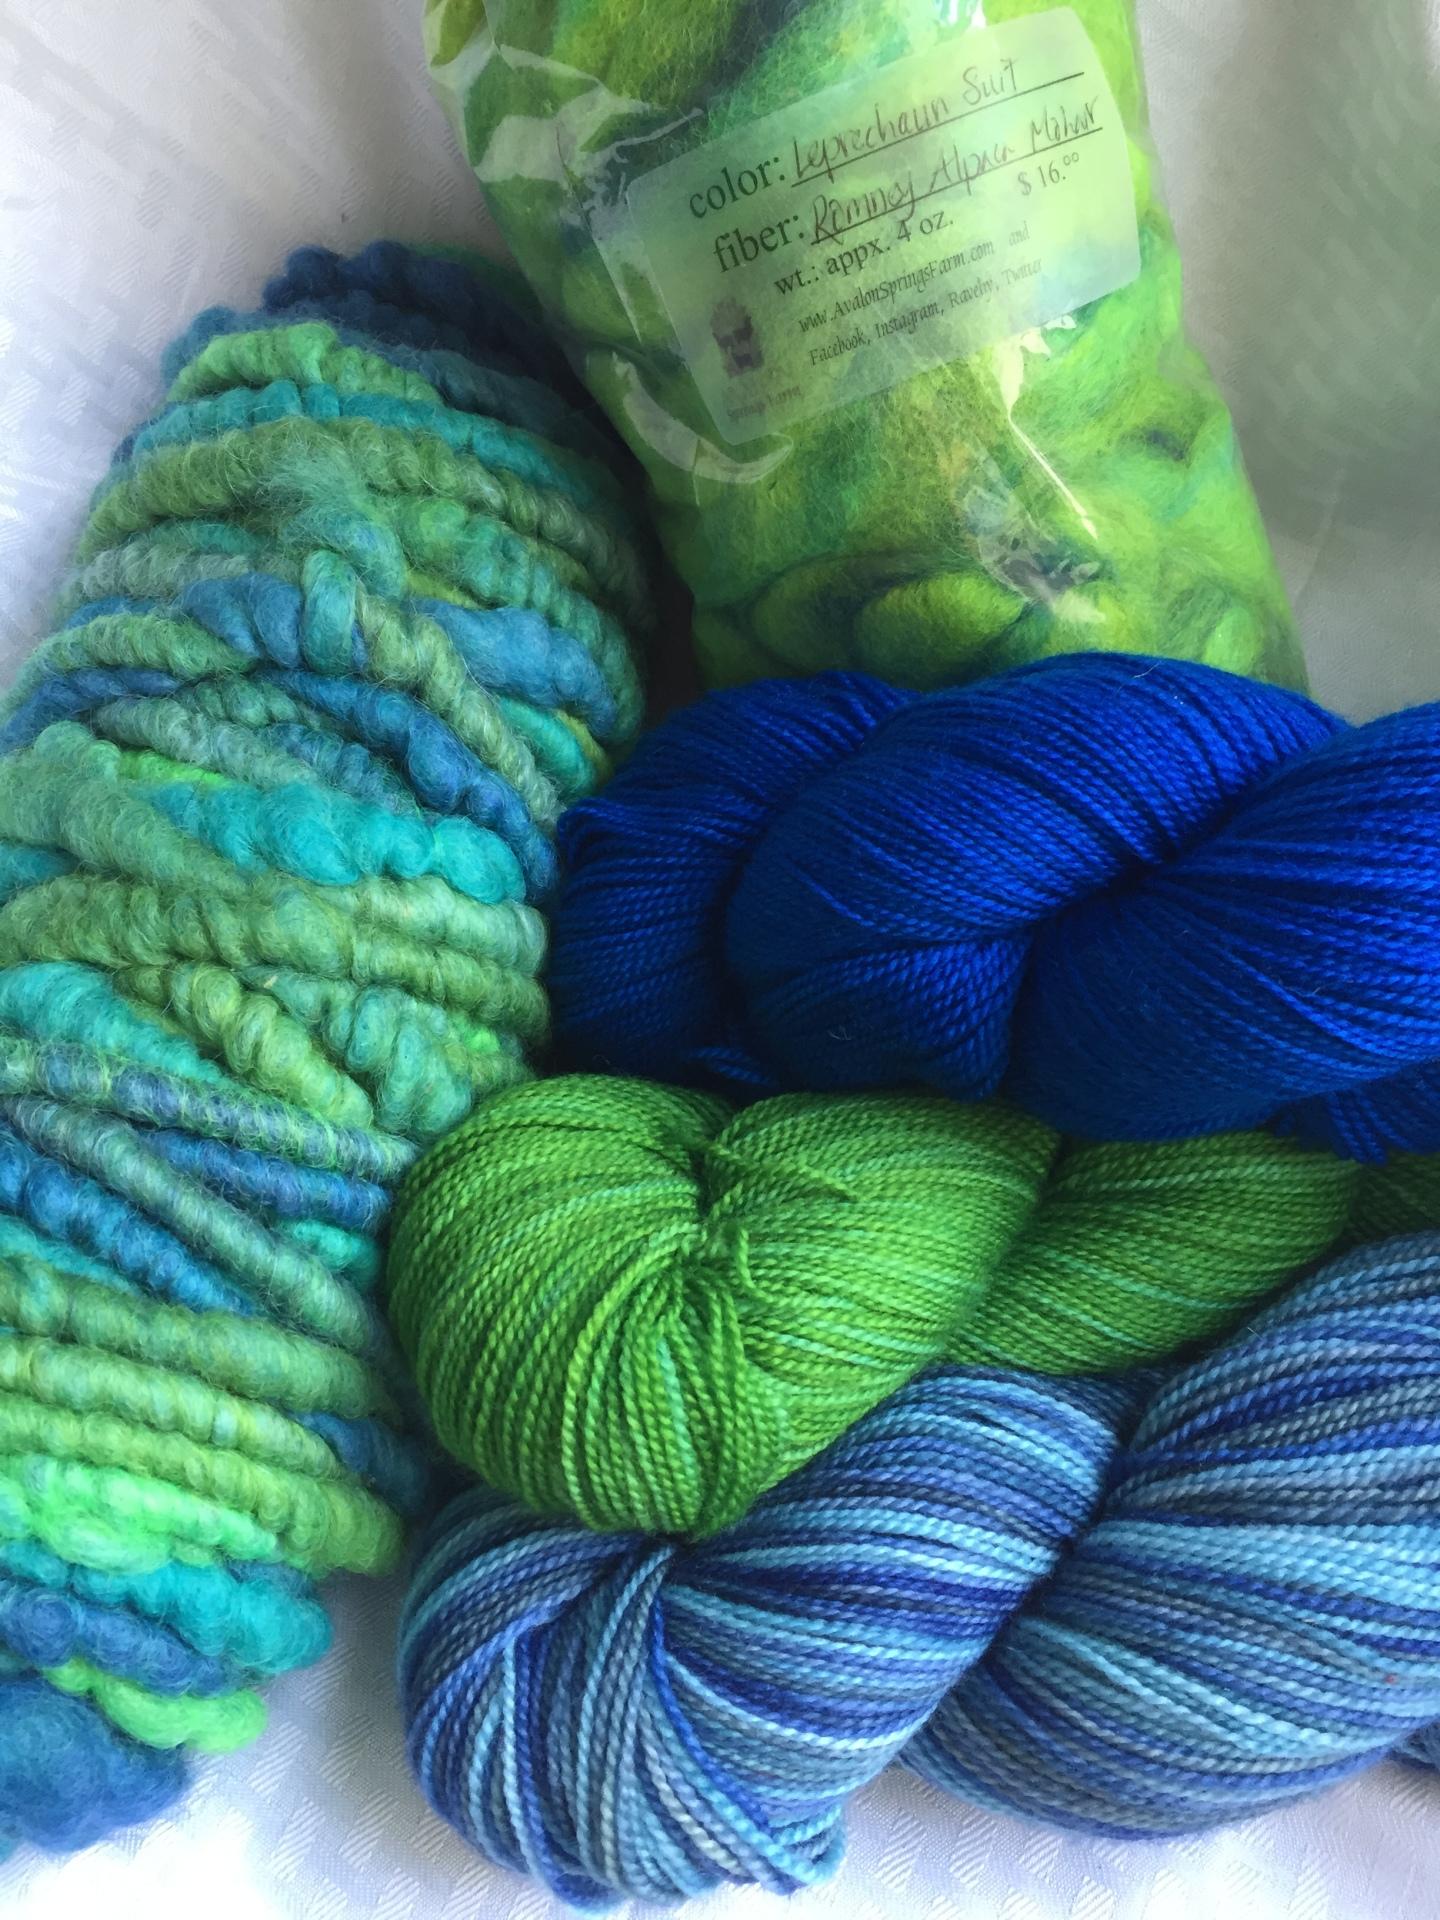 Interlocking colors of yarn with core-spun.